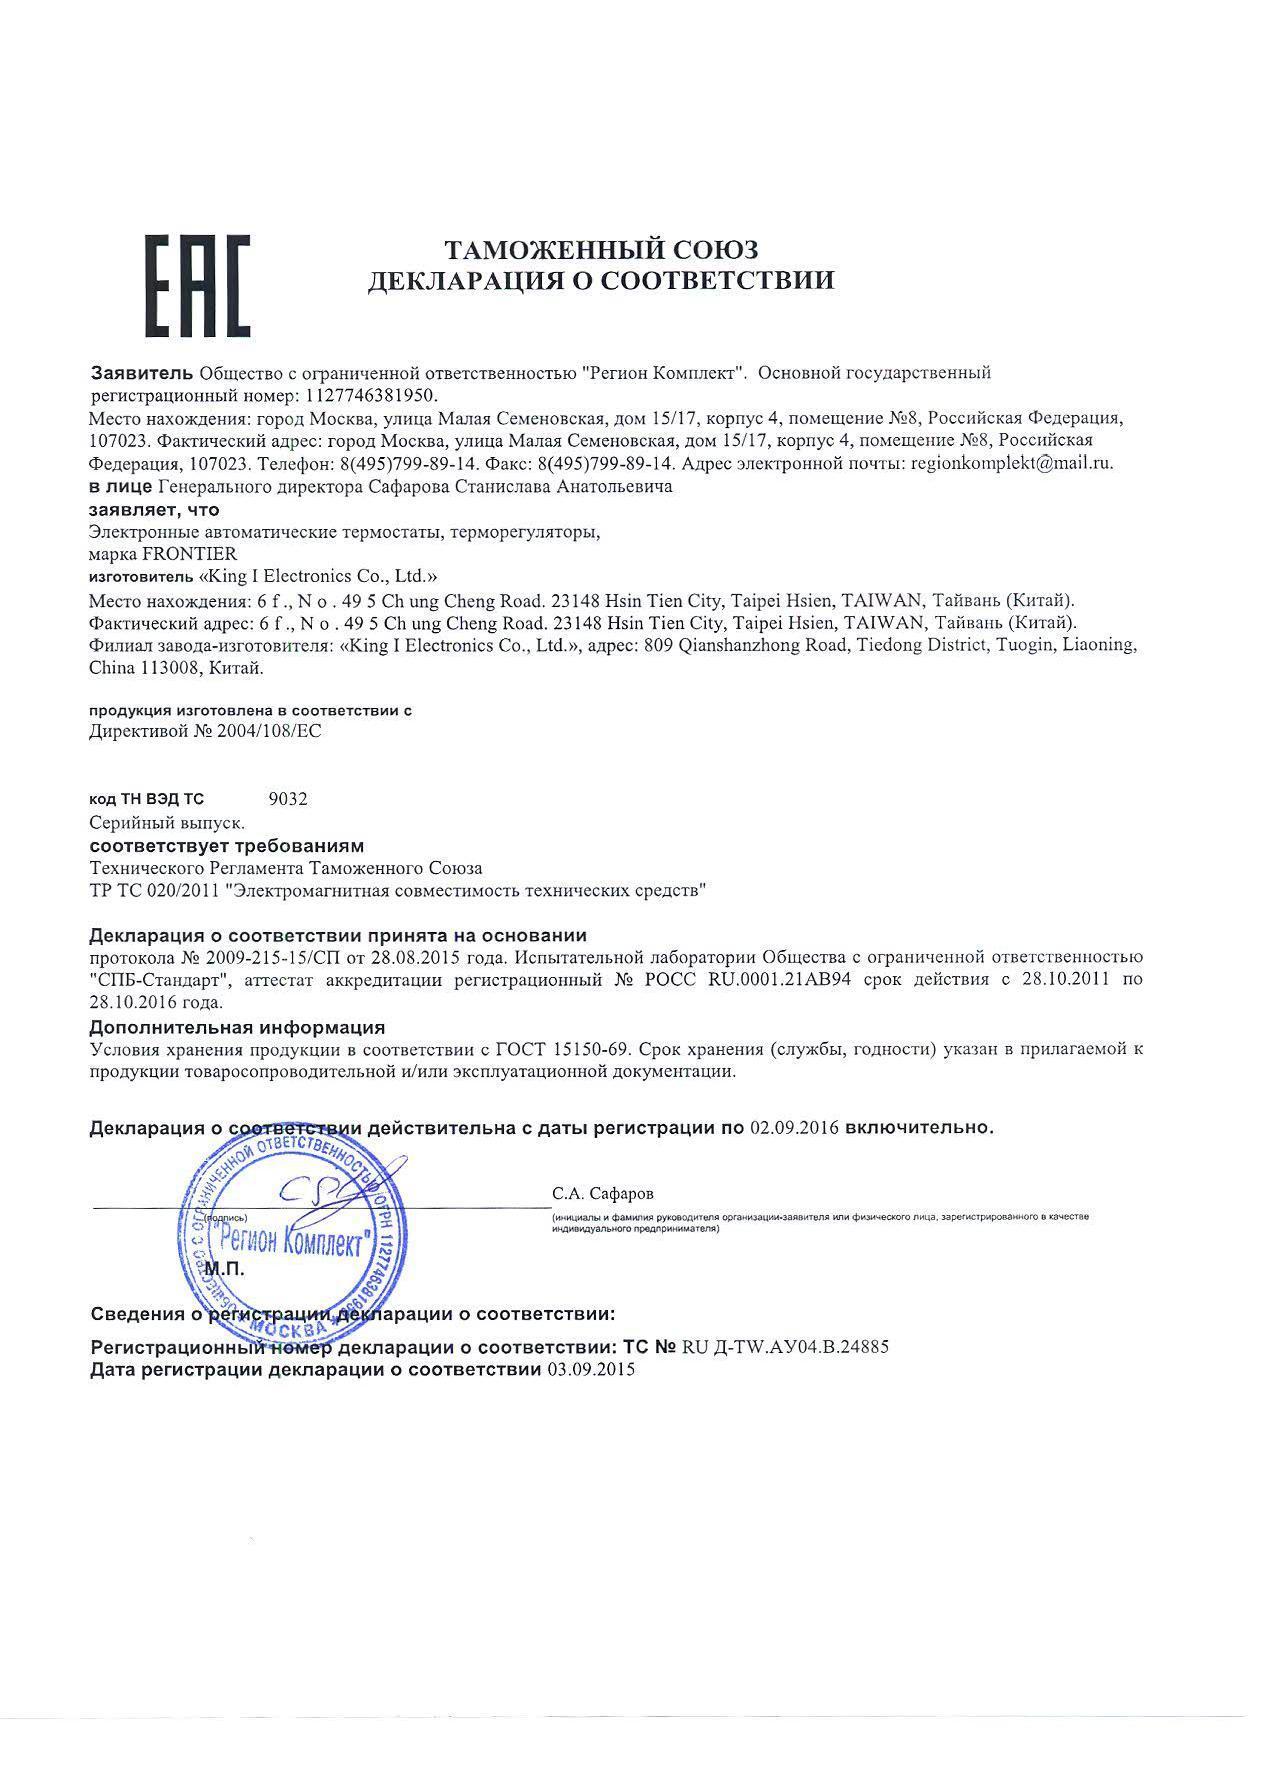 Сертификат соответствия на терморегулятор Frontier TH